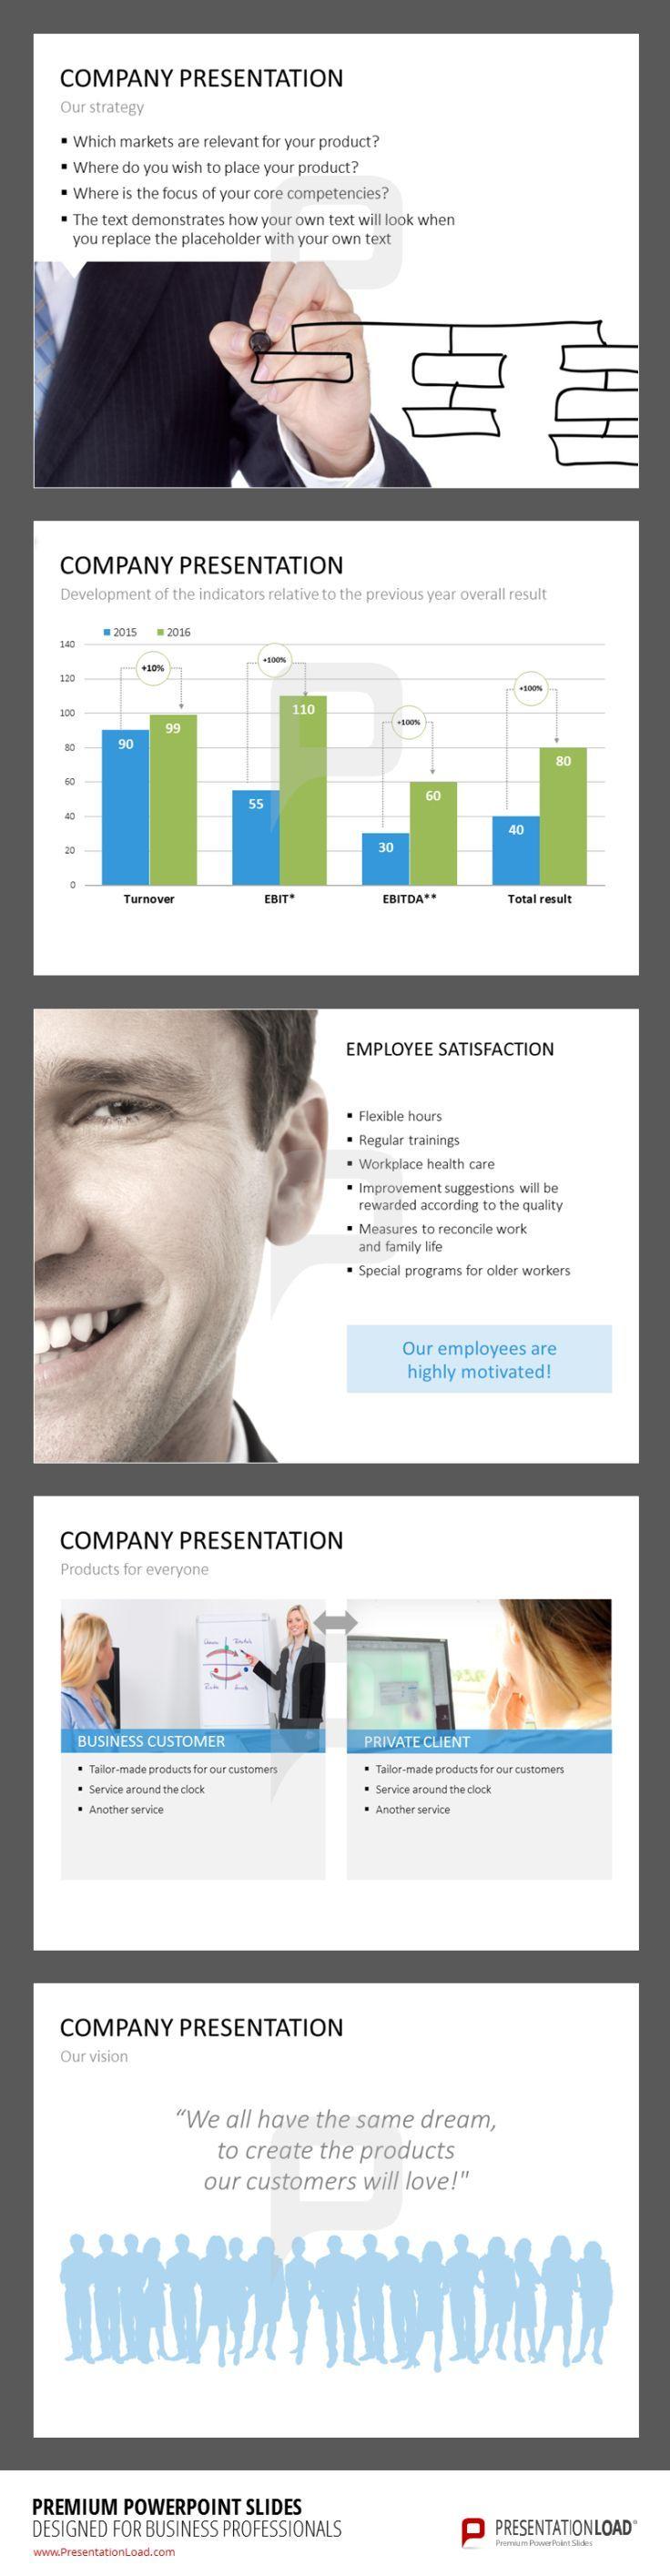 Präsentieren Sie alle relevanten Businessfaktoren wie ...